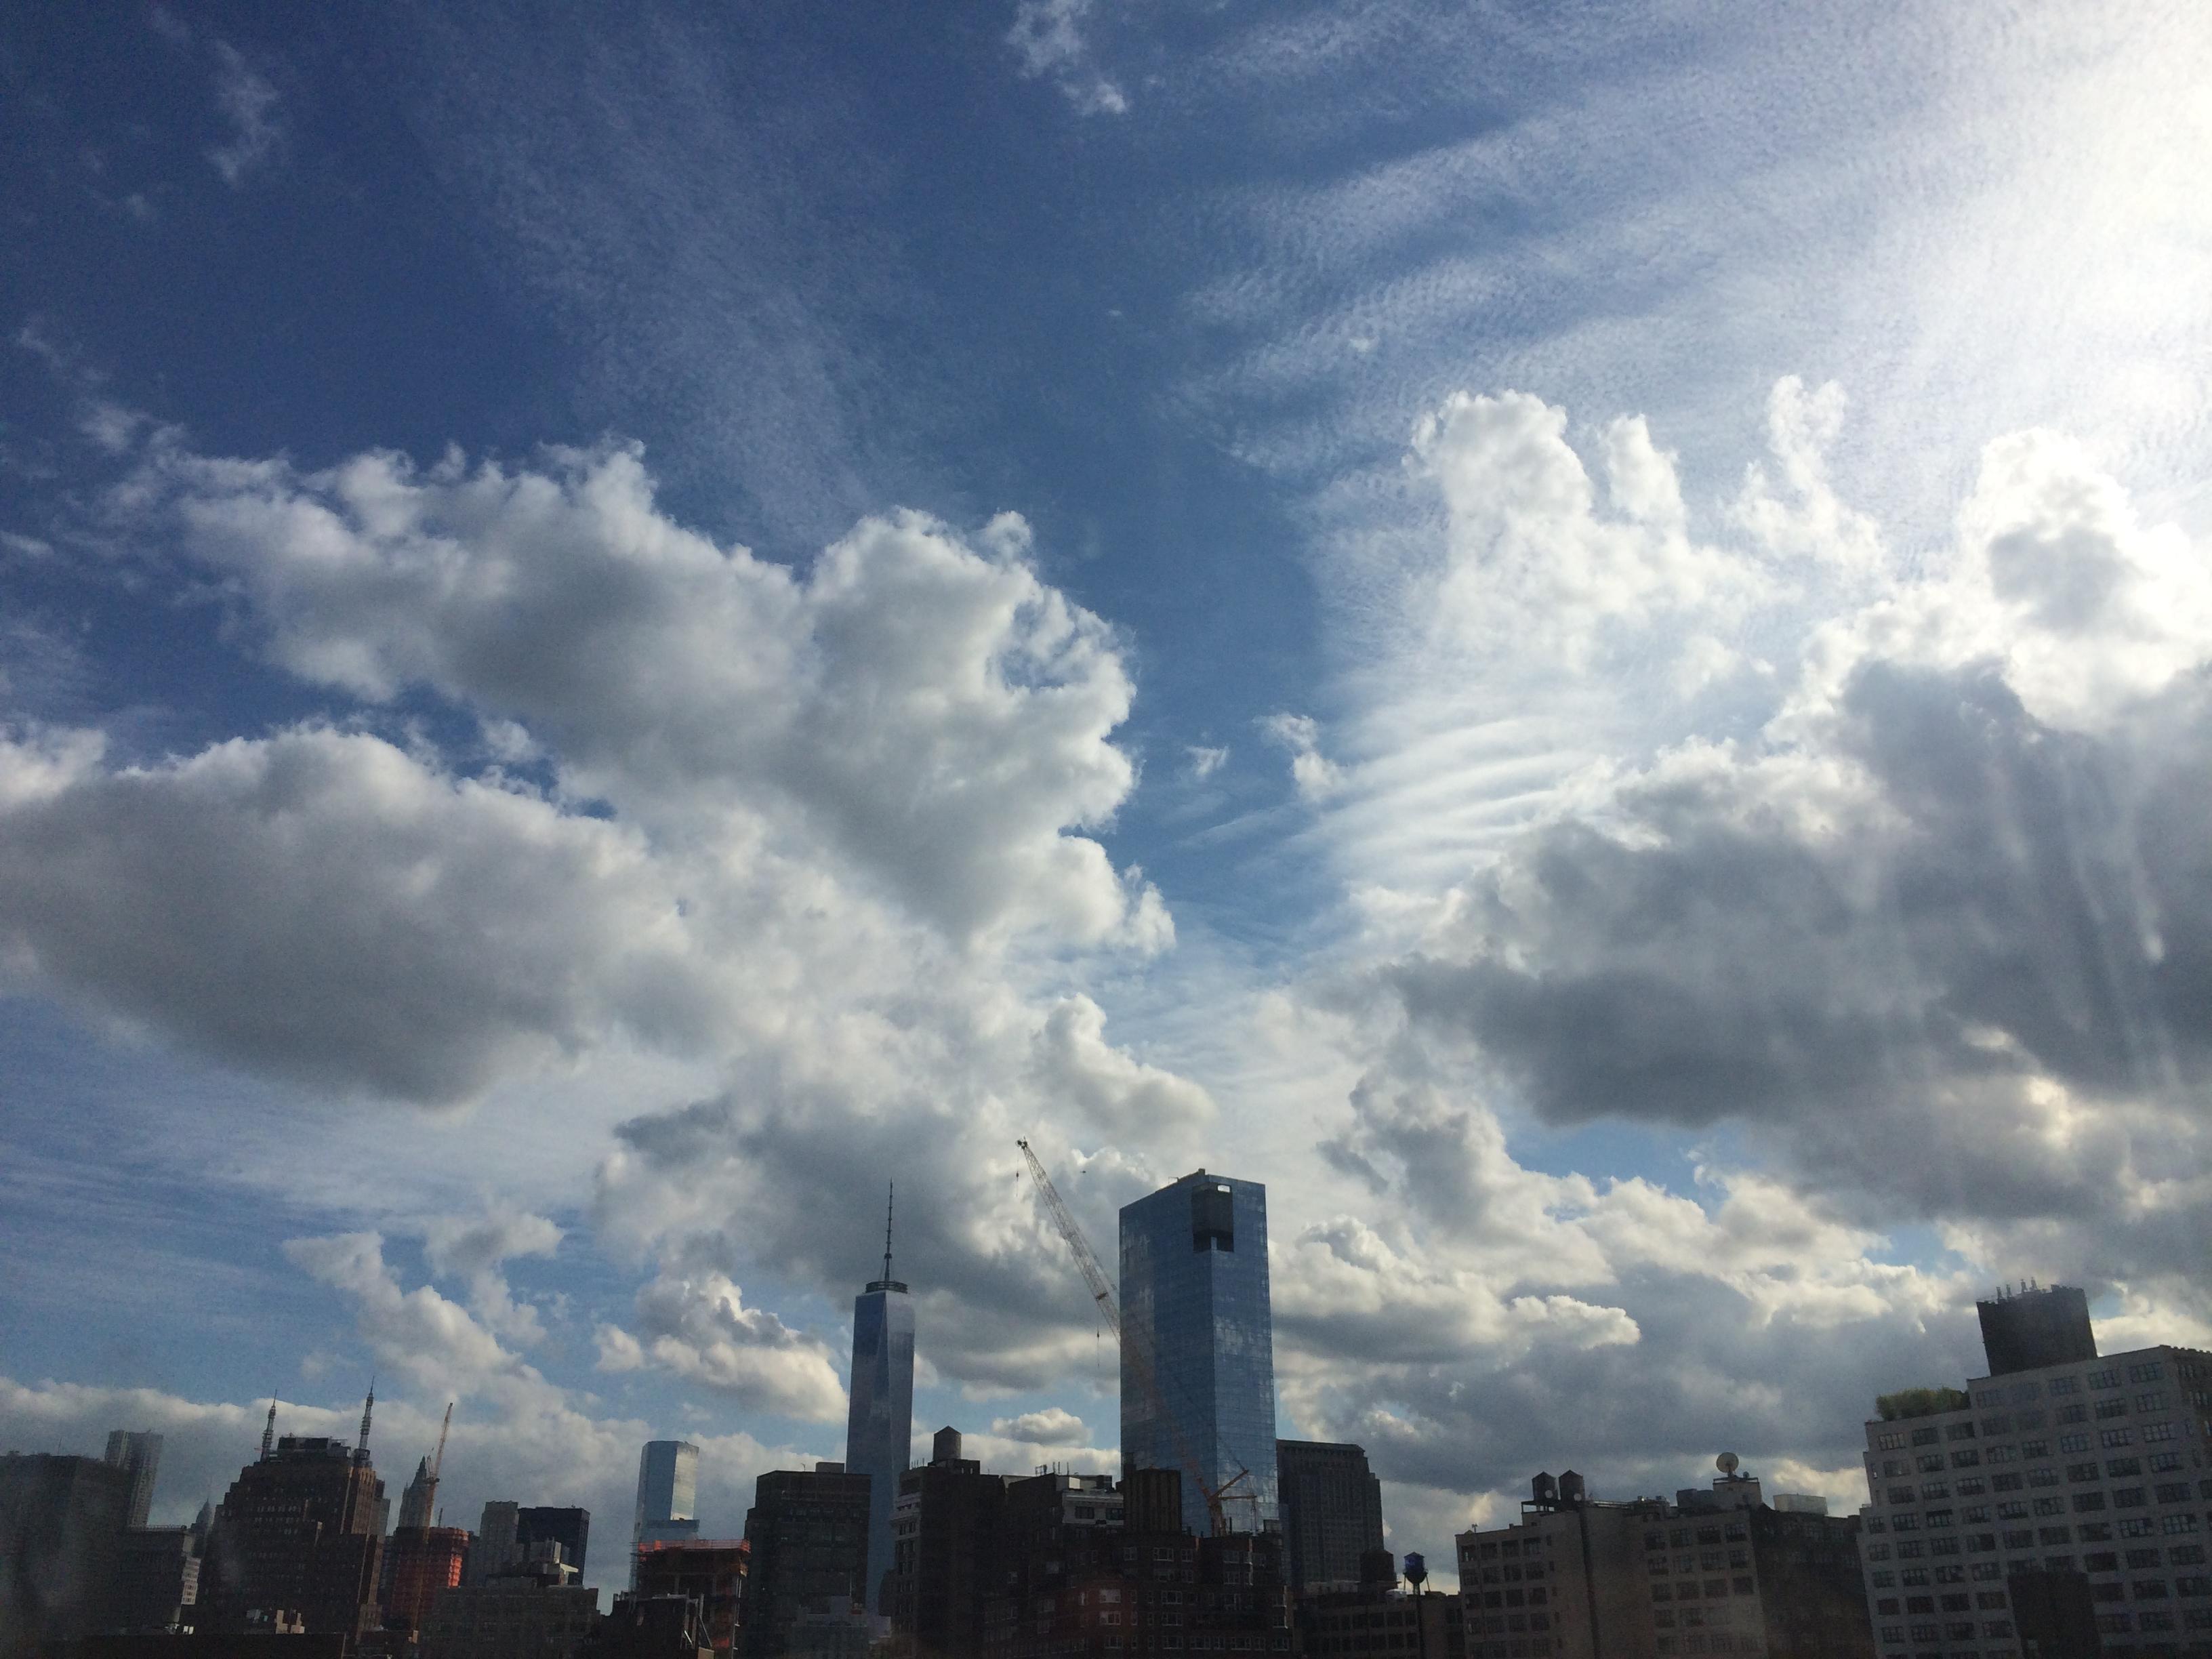 clouds above Manhattan skyline, including World Trade Center